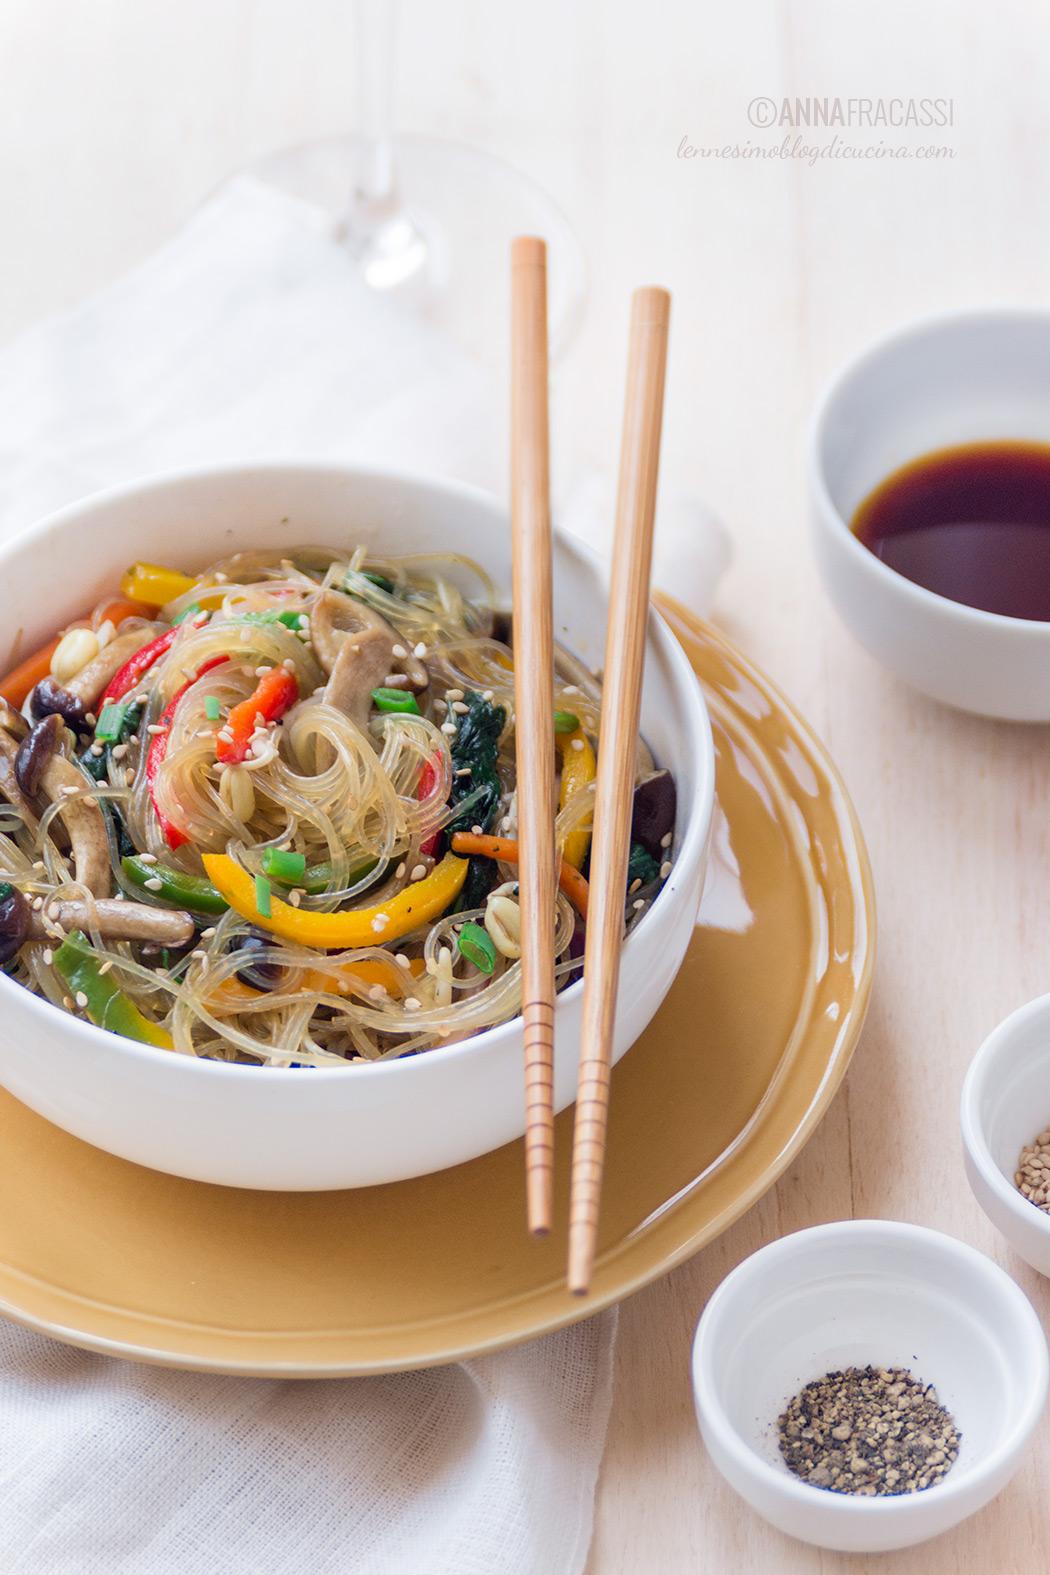 Japchae la ricetta dei noodles coreani al salto for Cucinare noodles